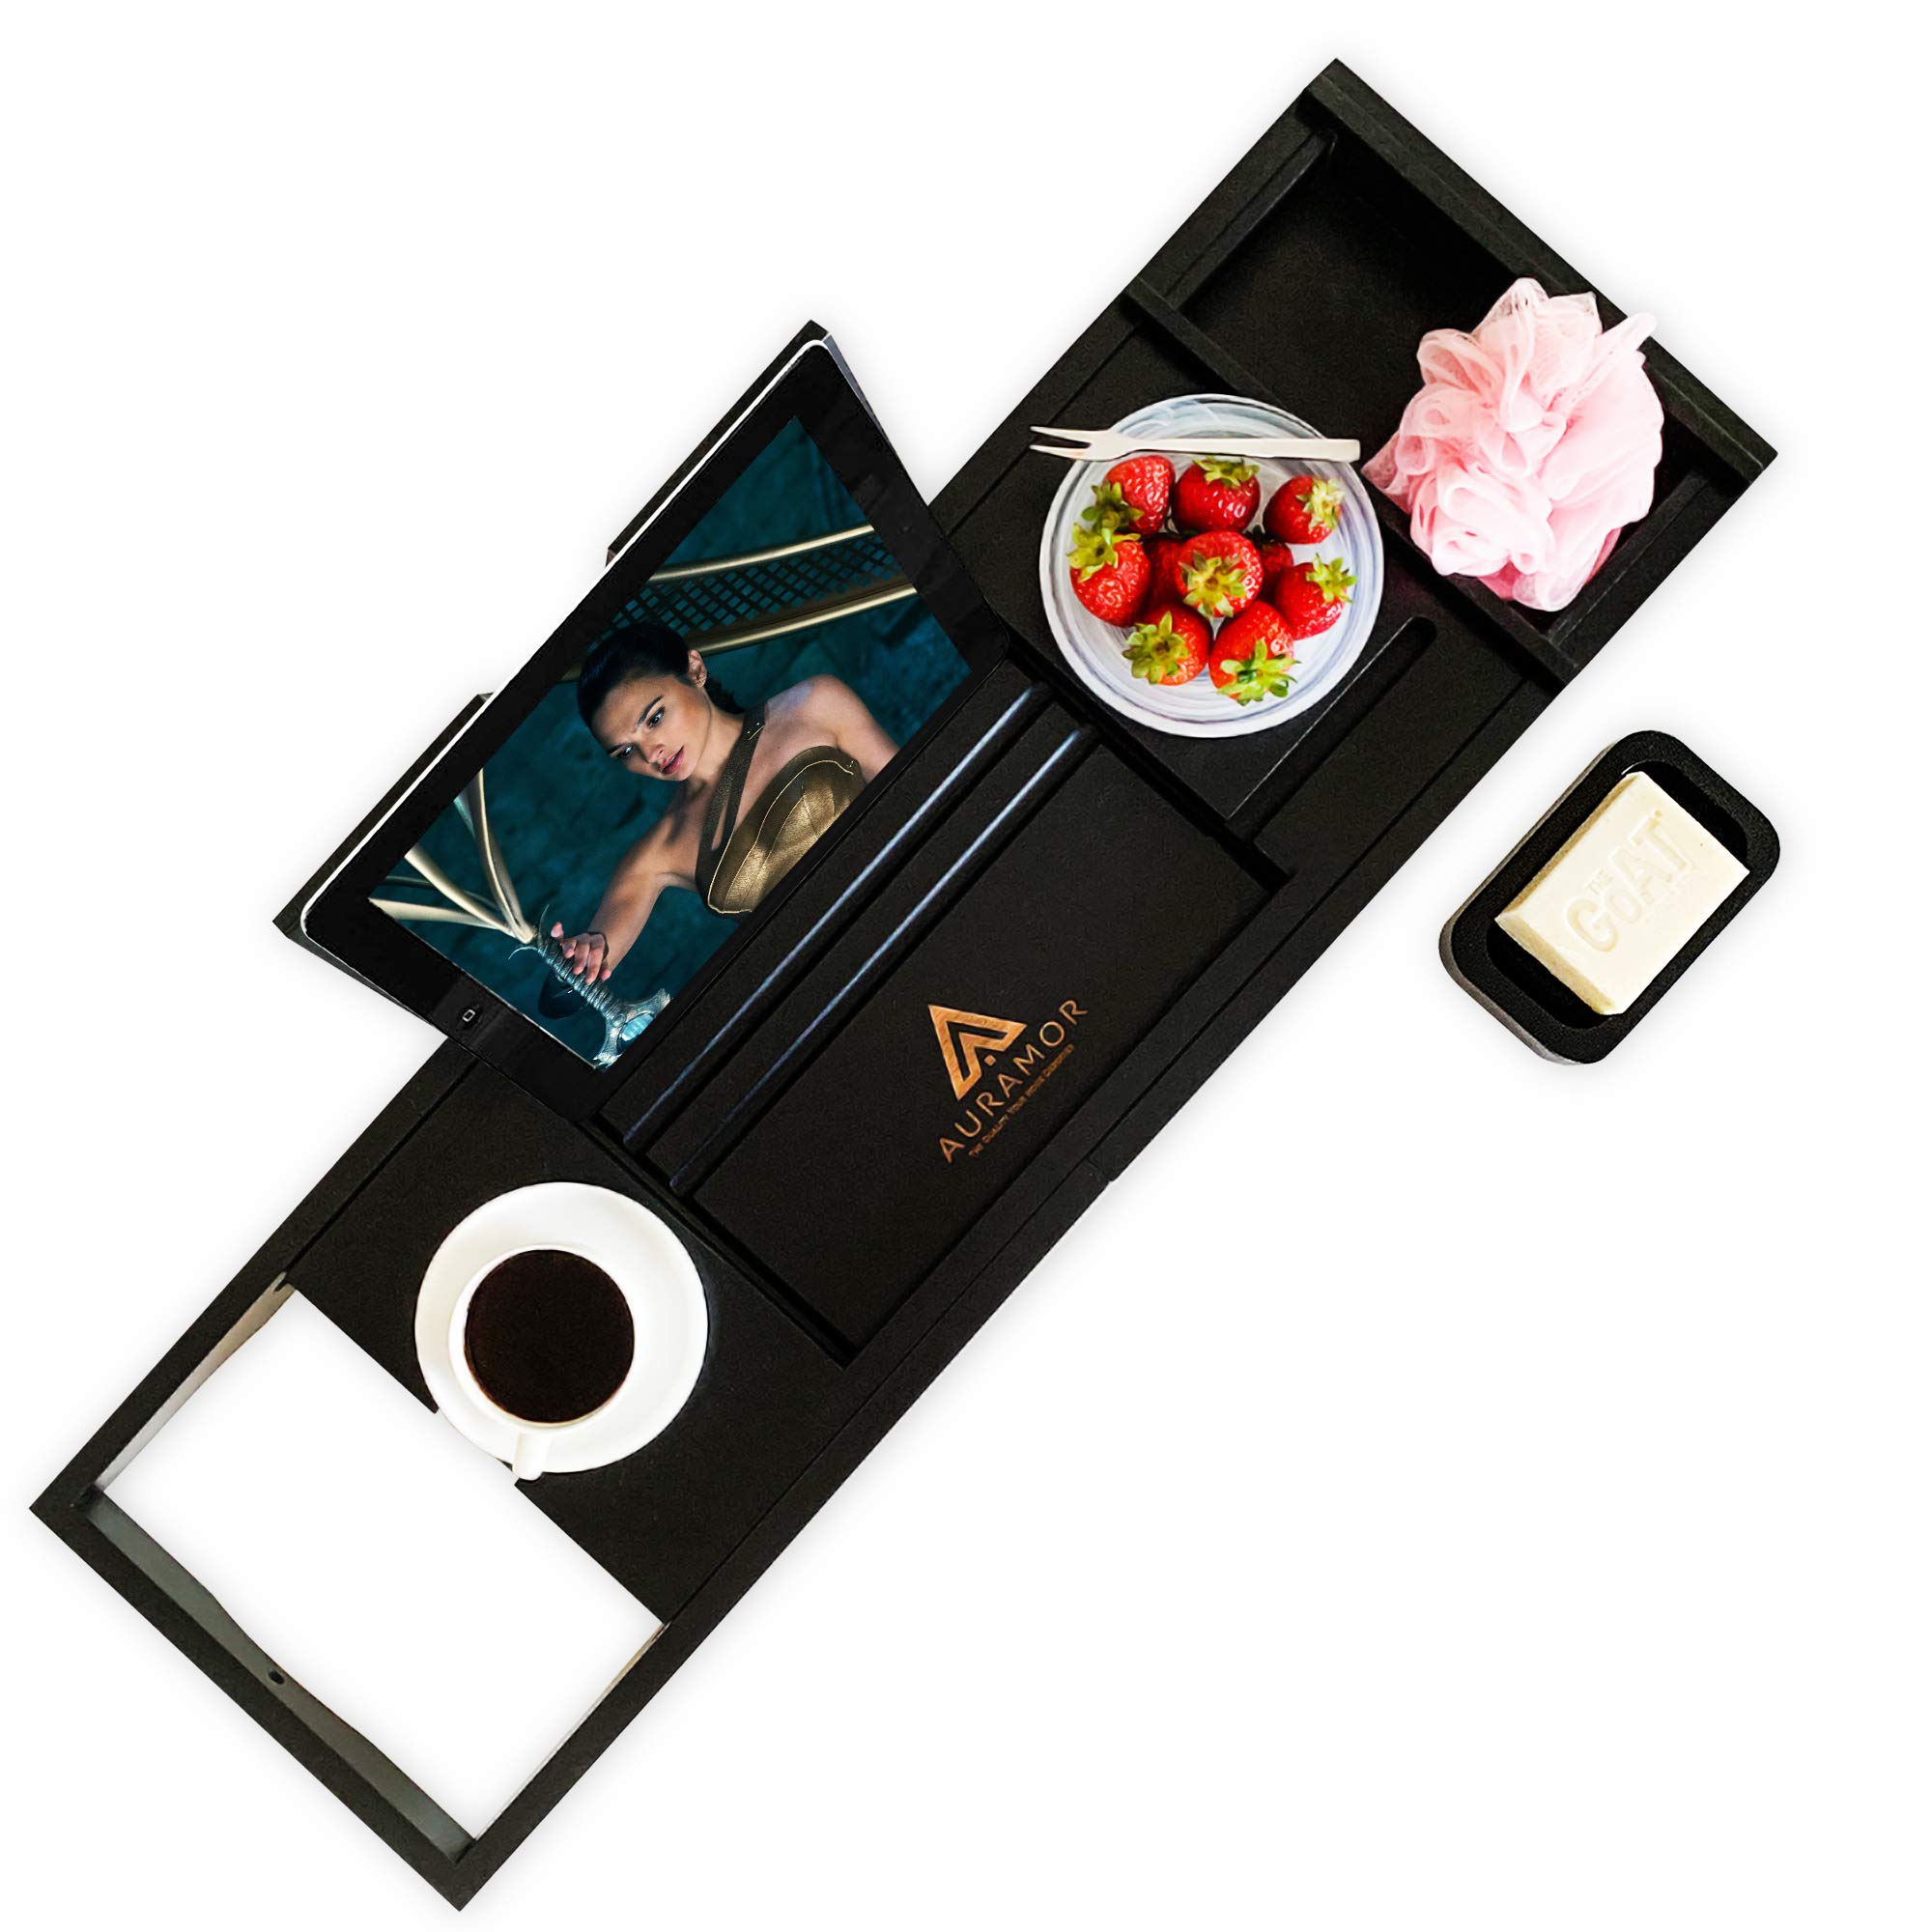 Auramor Bamboo Bathtub Tray Caddy w/Hair Turban (Black) Wide, Expandable Luxury Bath   Wine, Book, Tablet, Soap Holder   Non-Slip Rubber   Suction Cups